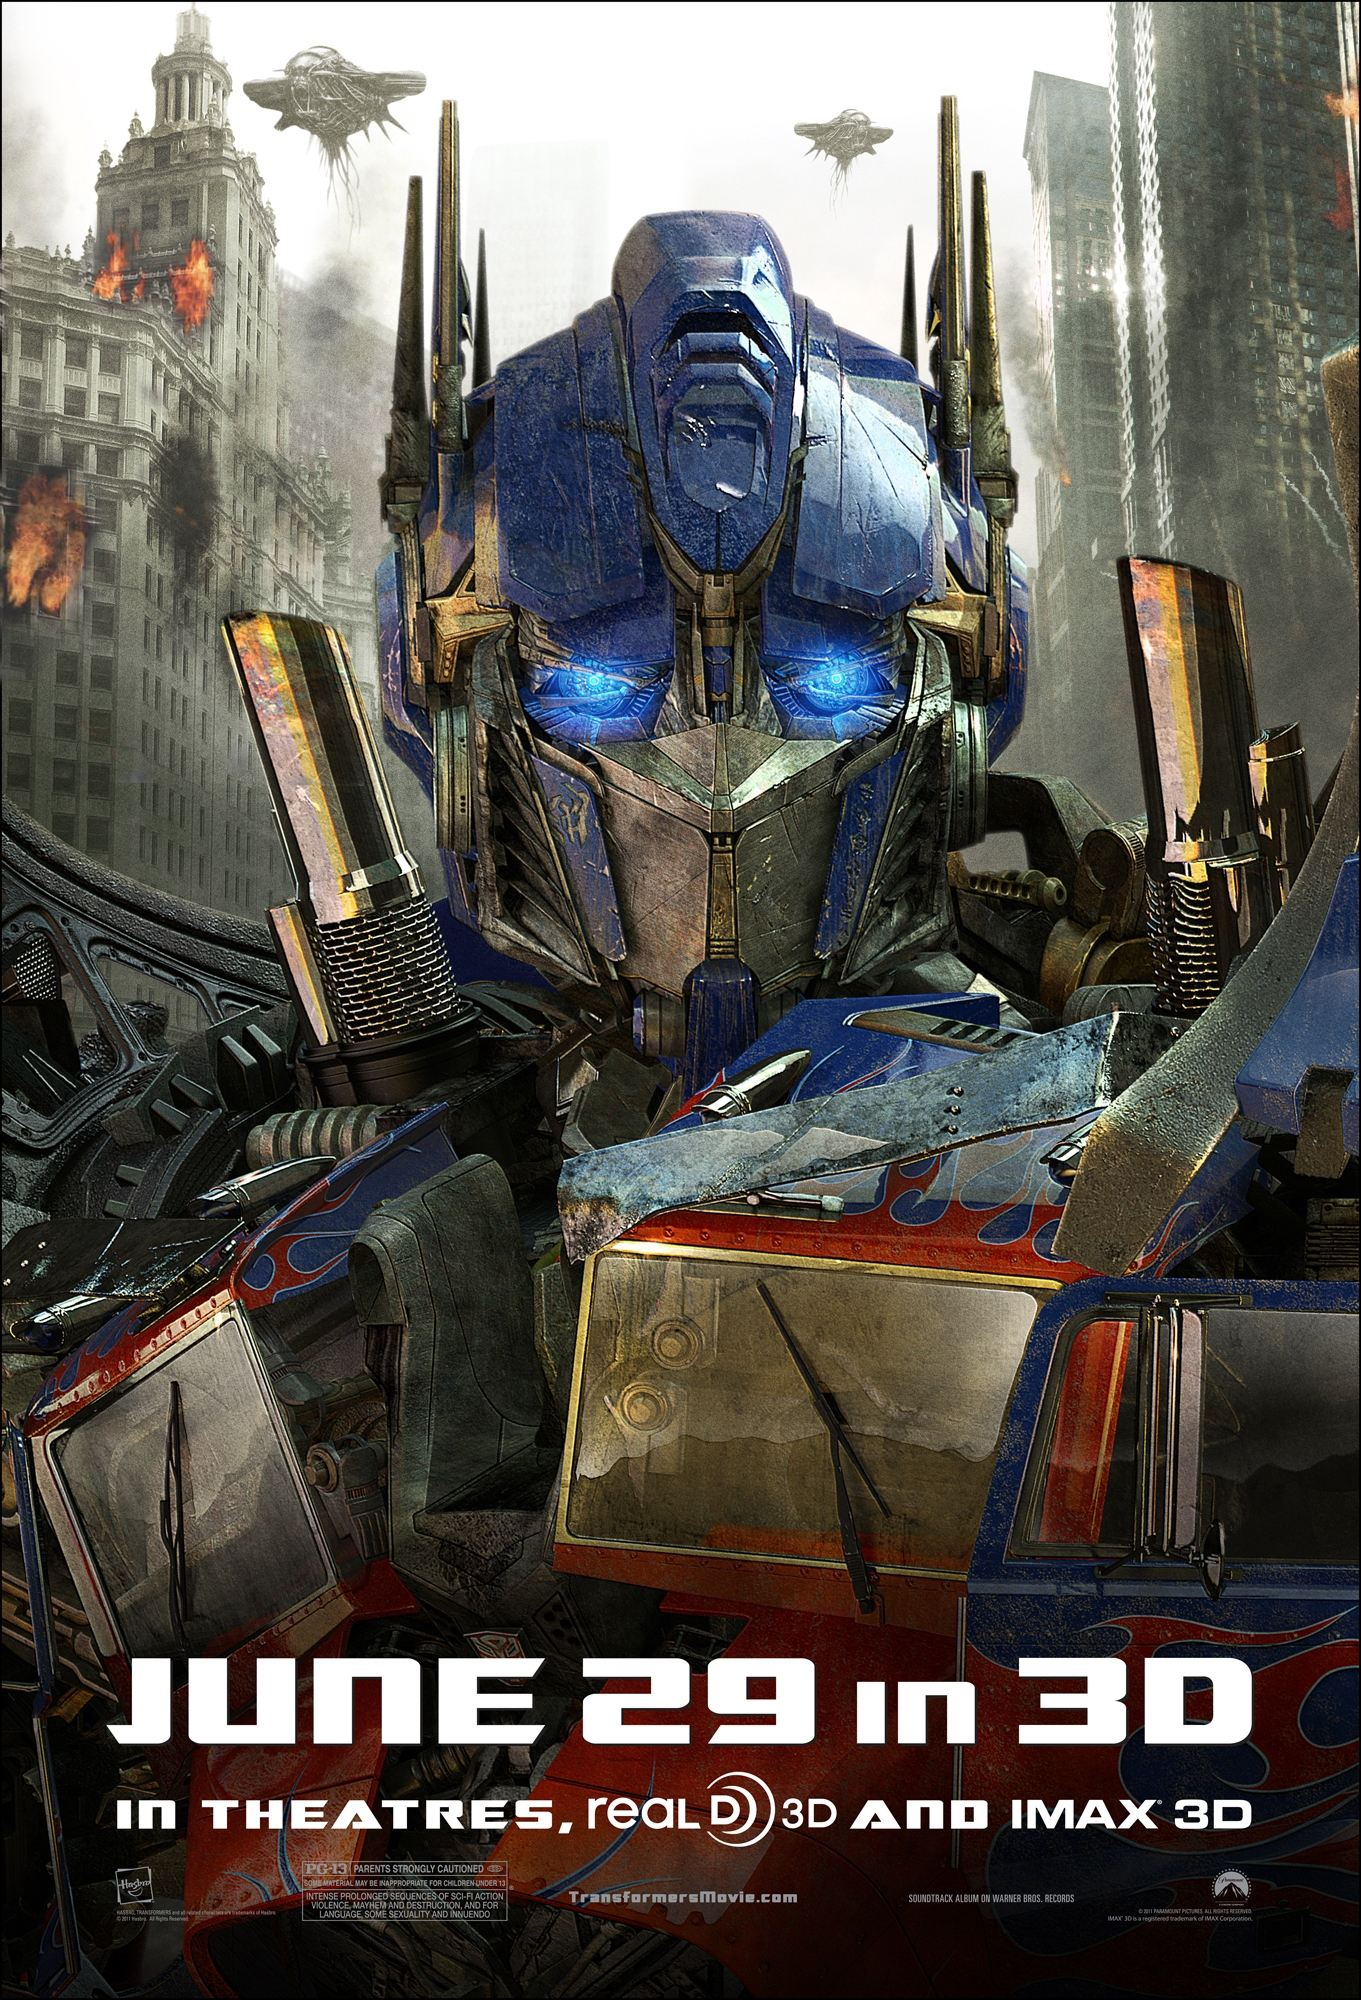 плакат фильма характер-постер Трансформеры 3: Темная сторона Луны